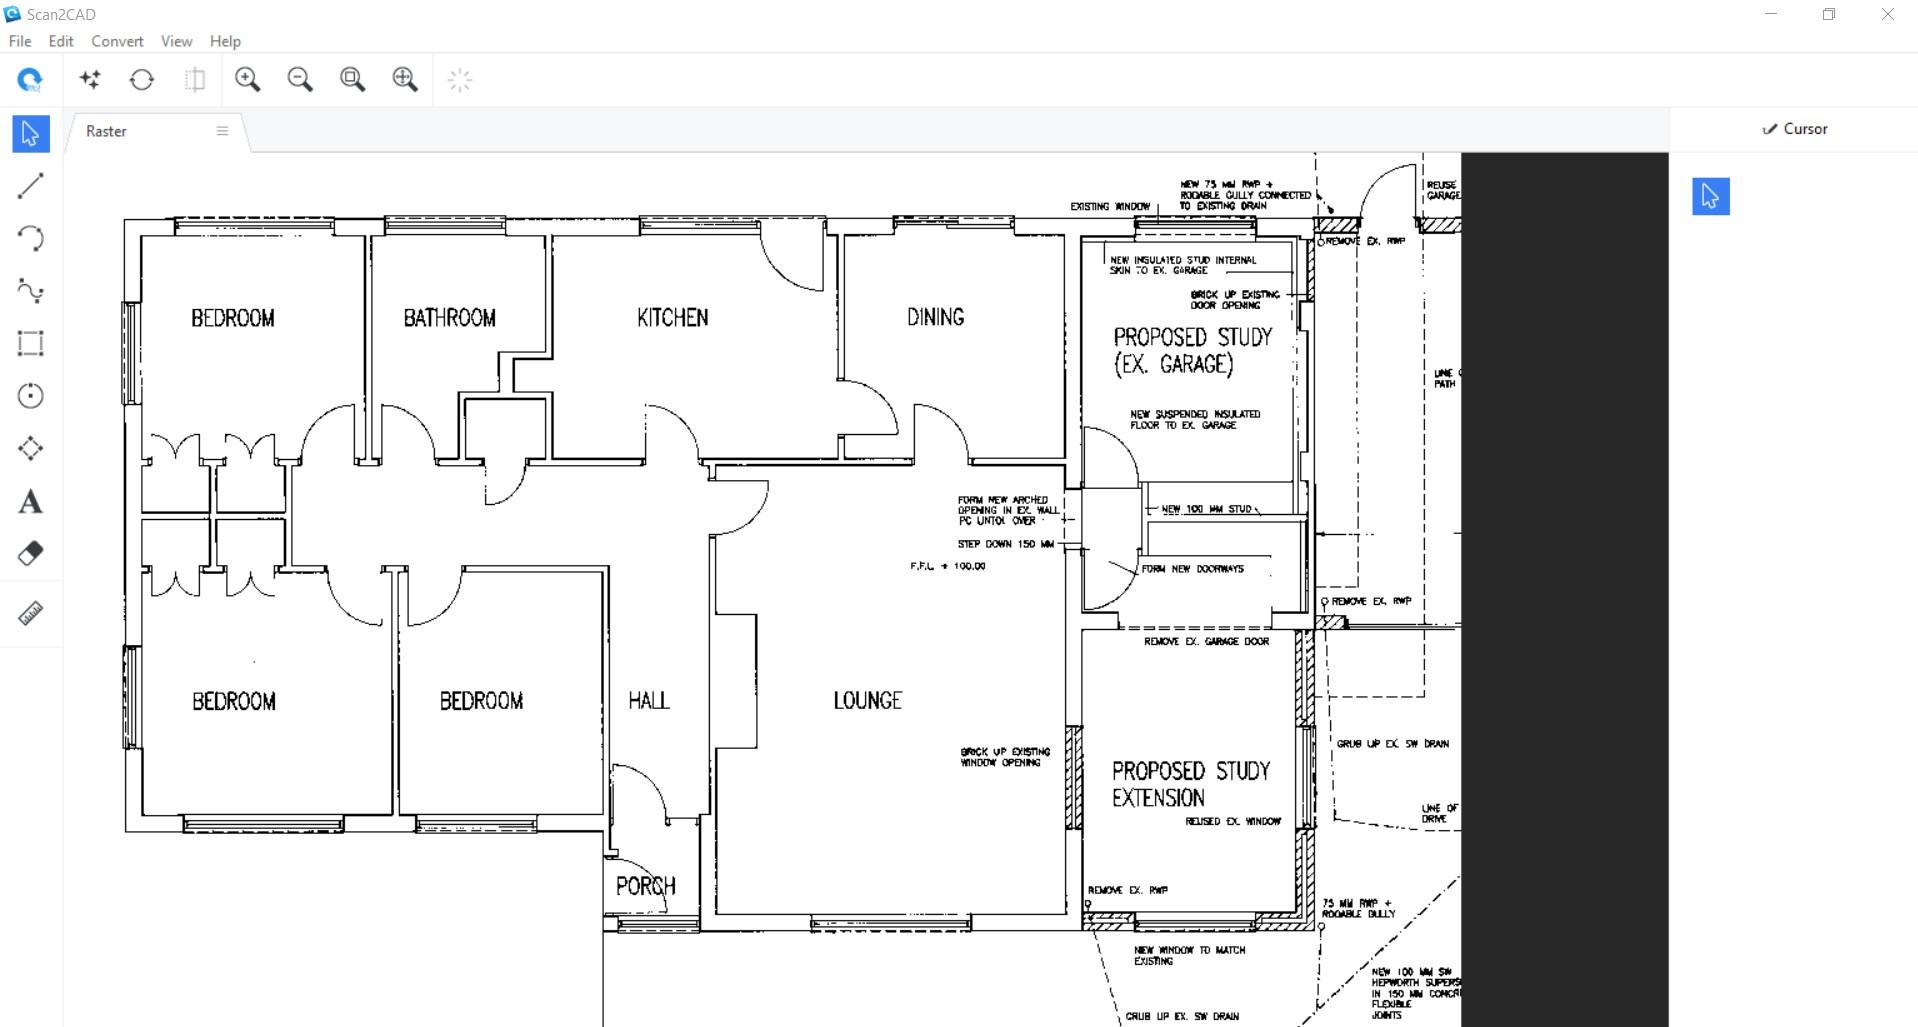 screenshot of raster floor plan